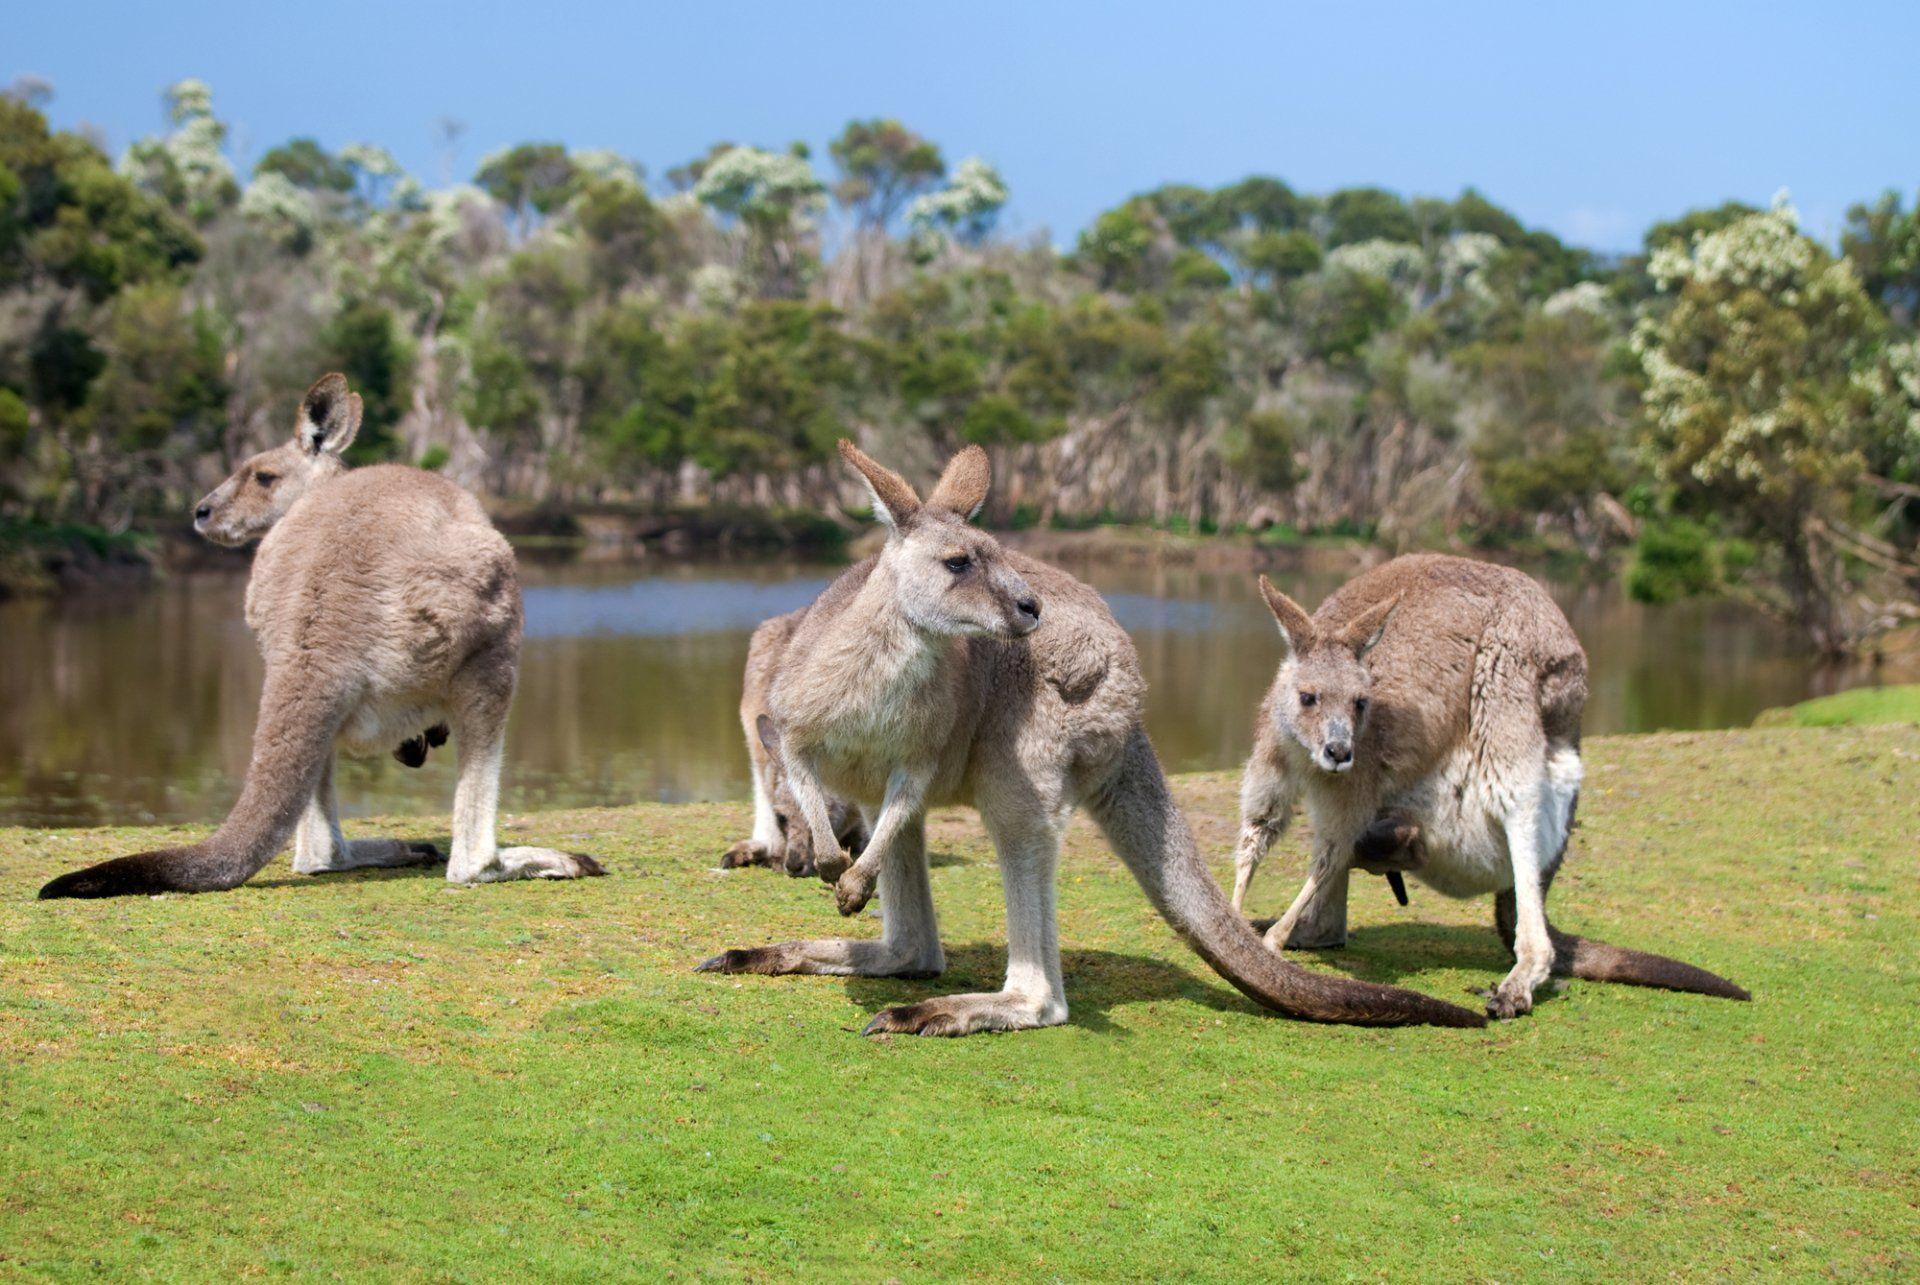 Wildlife Park In Arlington Wa The Outback Kangaroo Farm